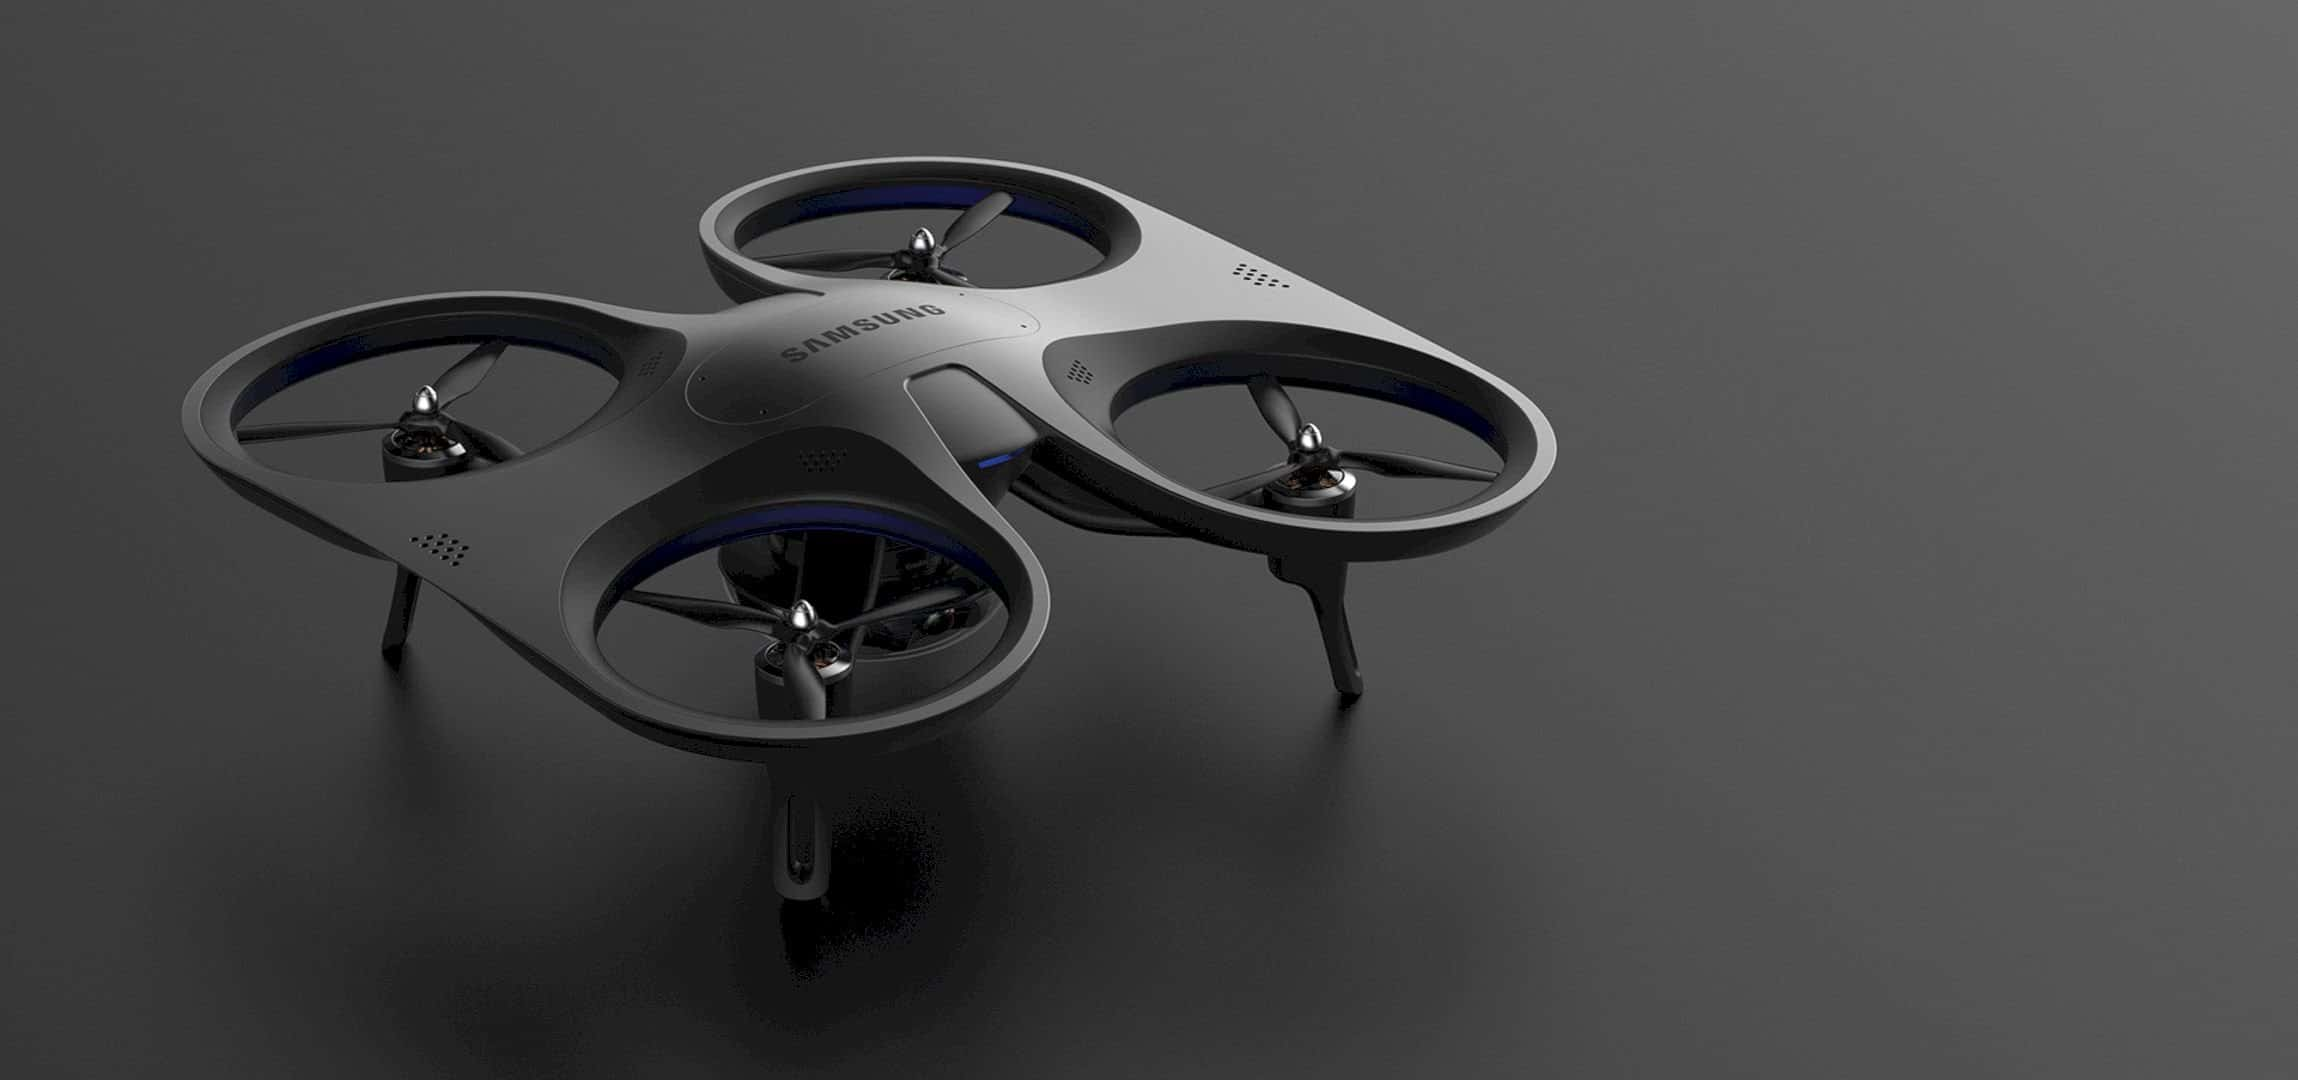 DNDN A Public Drone Safety Escort Service 14